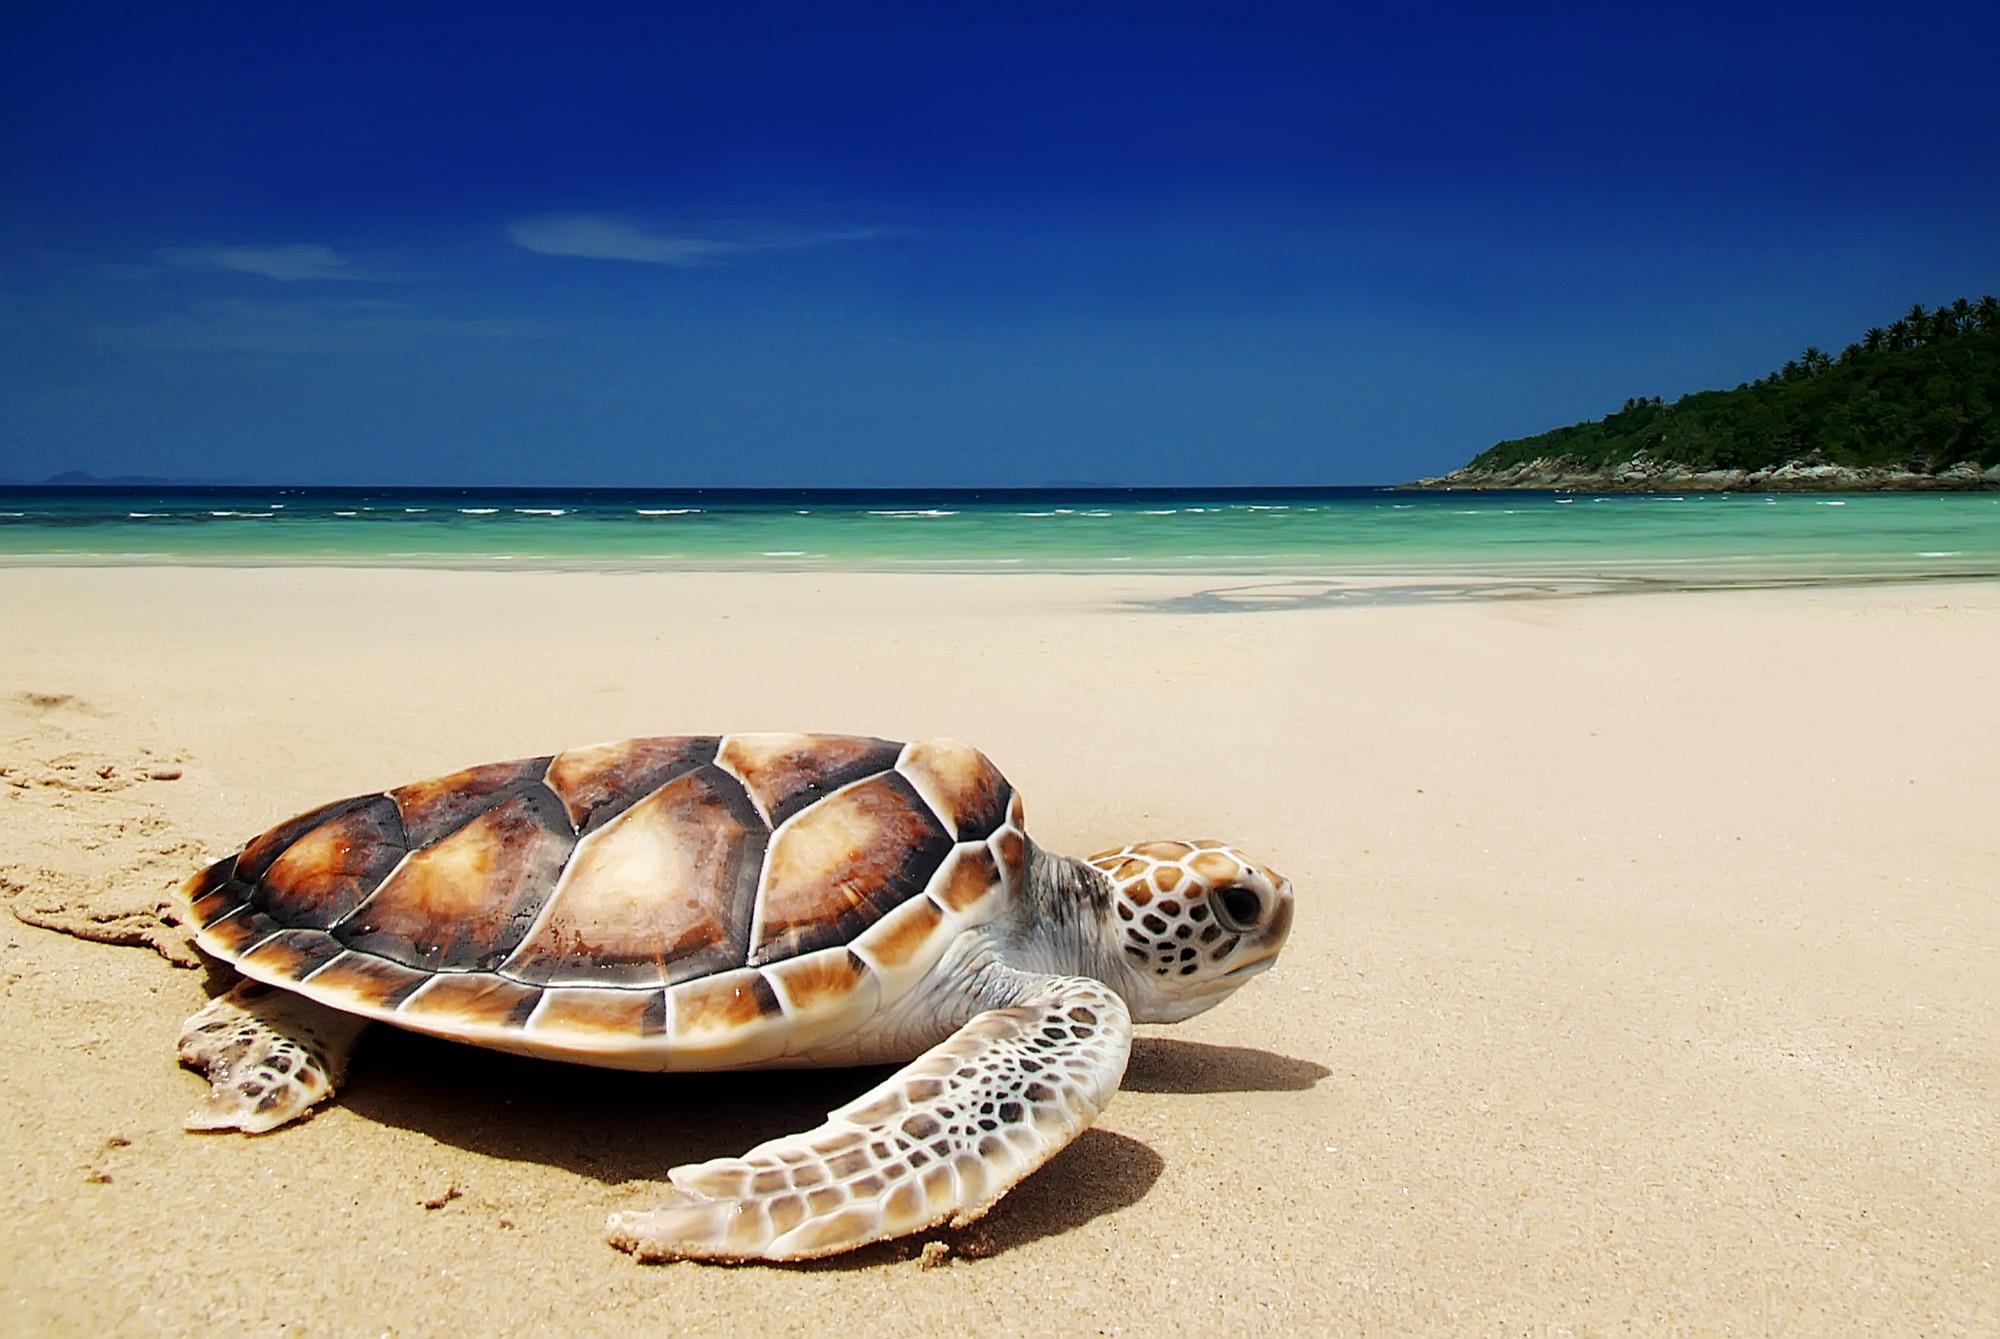 Sea turtle on the beach-72 ppi